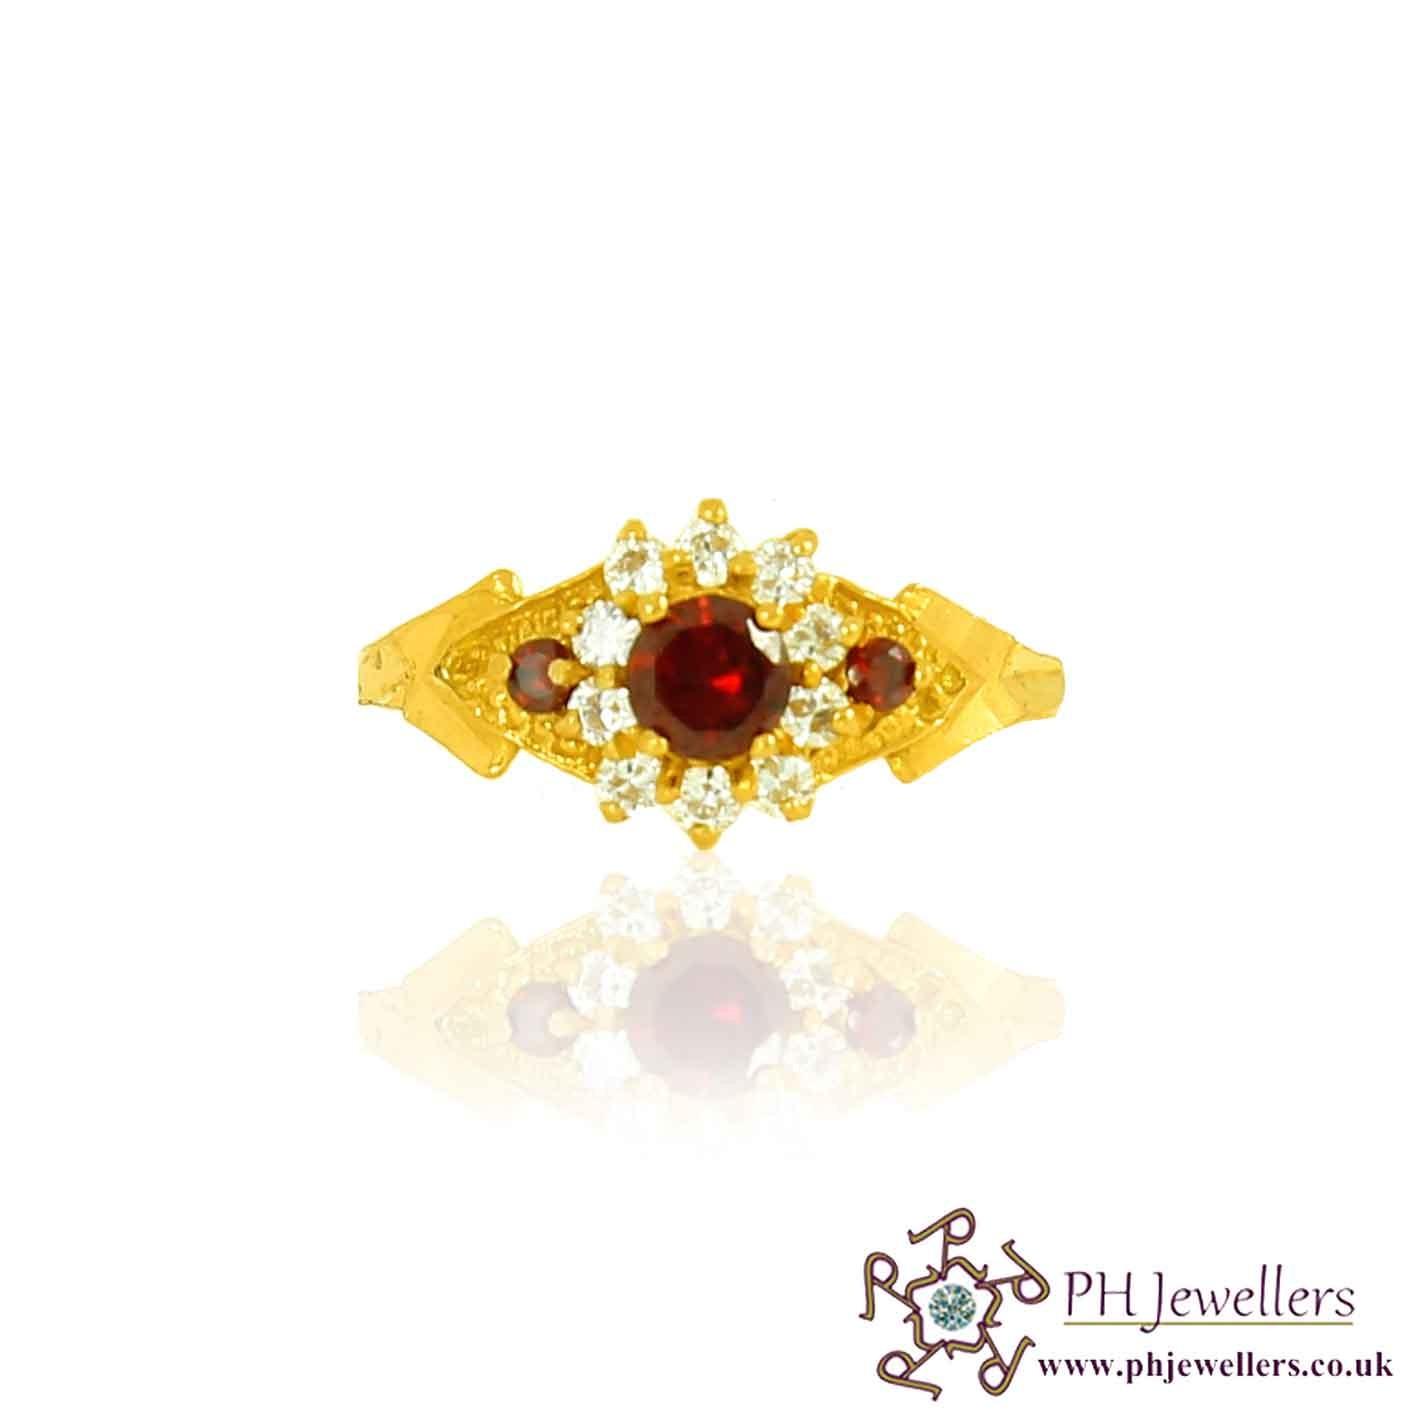 22ct 916 Hallmark Yellow Gold Garnet Size O Ring CZ SR98